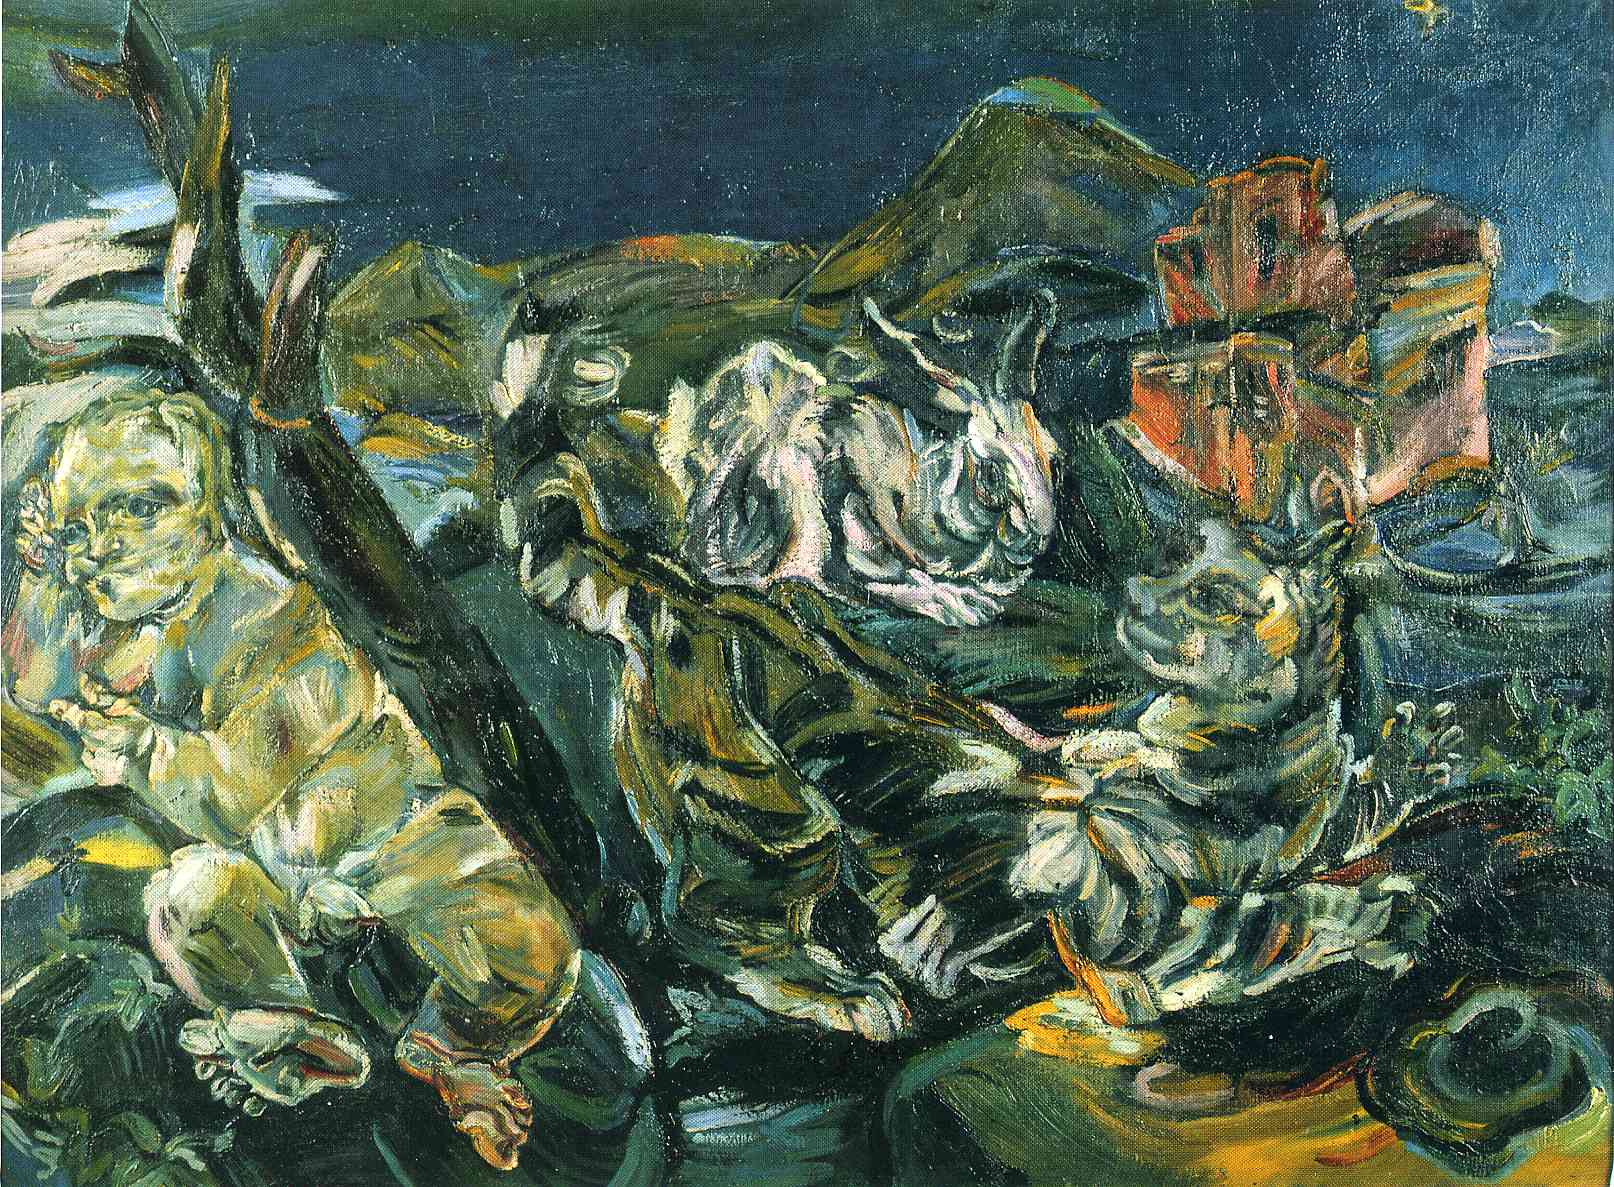 the life and works of oskar kokoschka Oskar kokoschka (1 march 1886 – 22 february 1980) was an austrian artist, poet and playwright best known for his intense expressionistic portraits and landscapes he was born in pöchlarn, second child to gustav josef kokoschka, a czech goldsmith, and maria romana kokoschka (née loidl) his older .